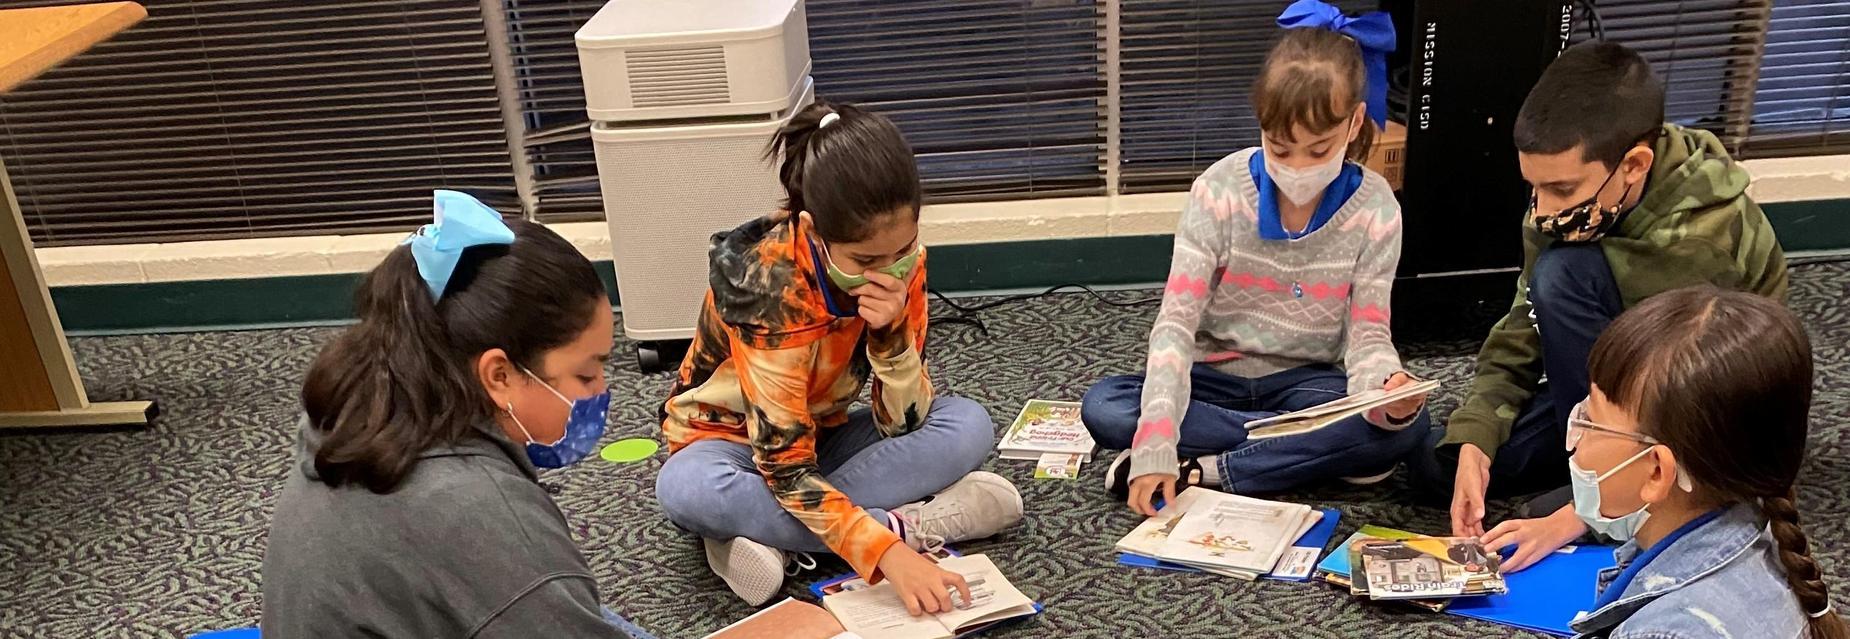 4th graders reading